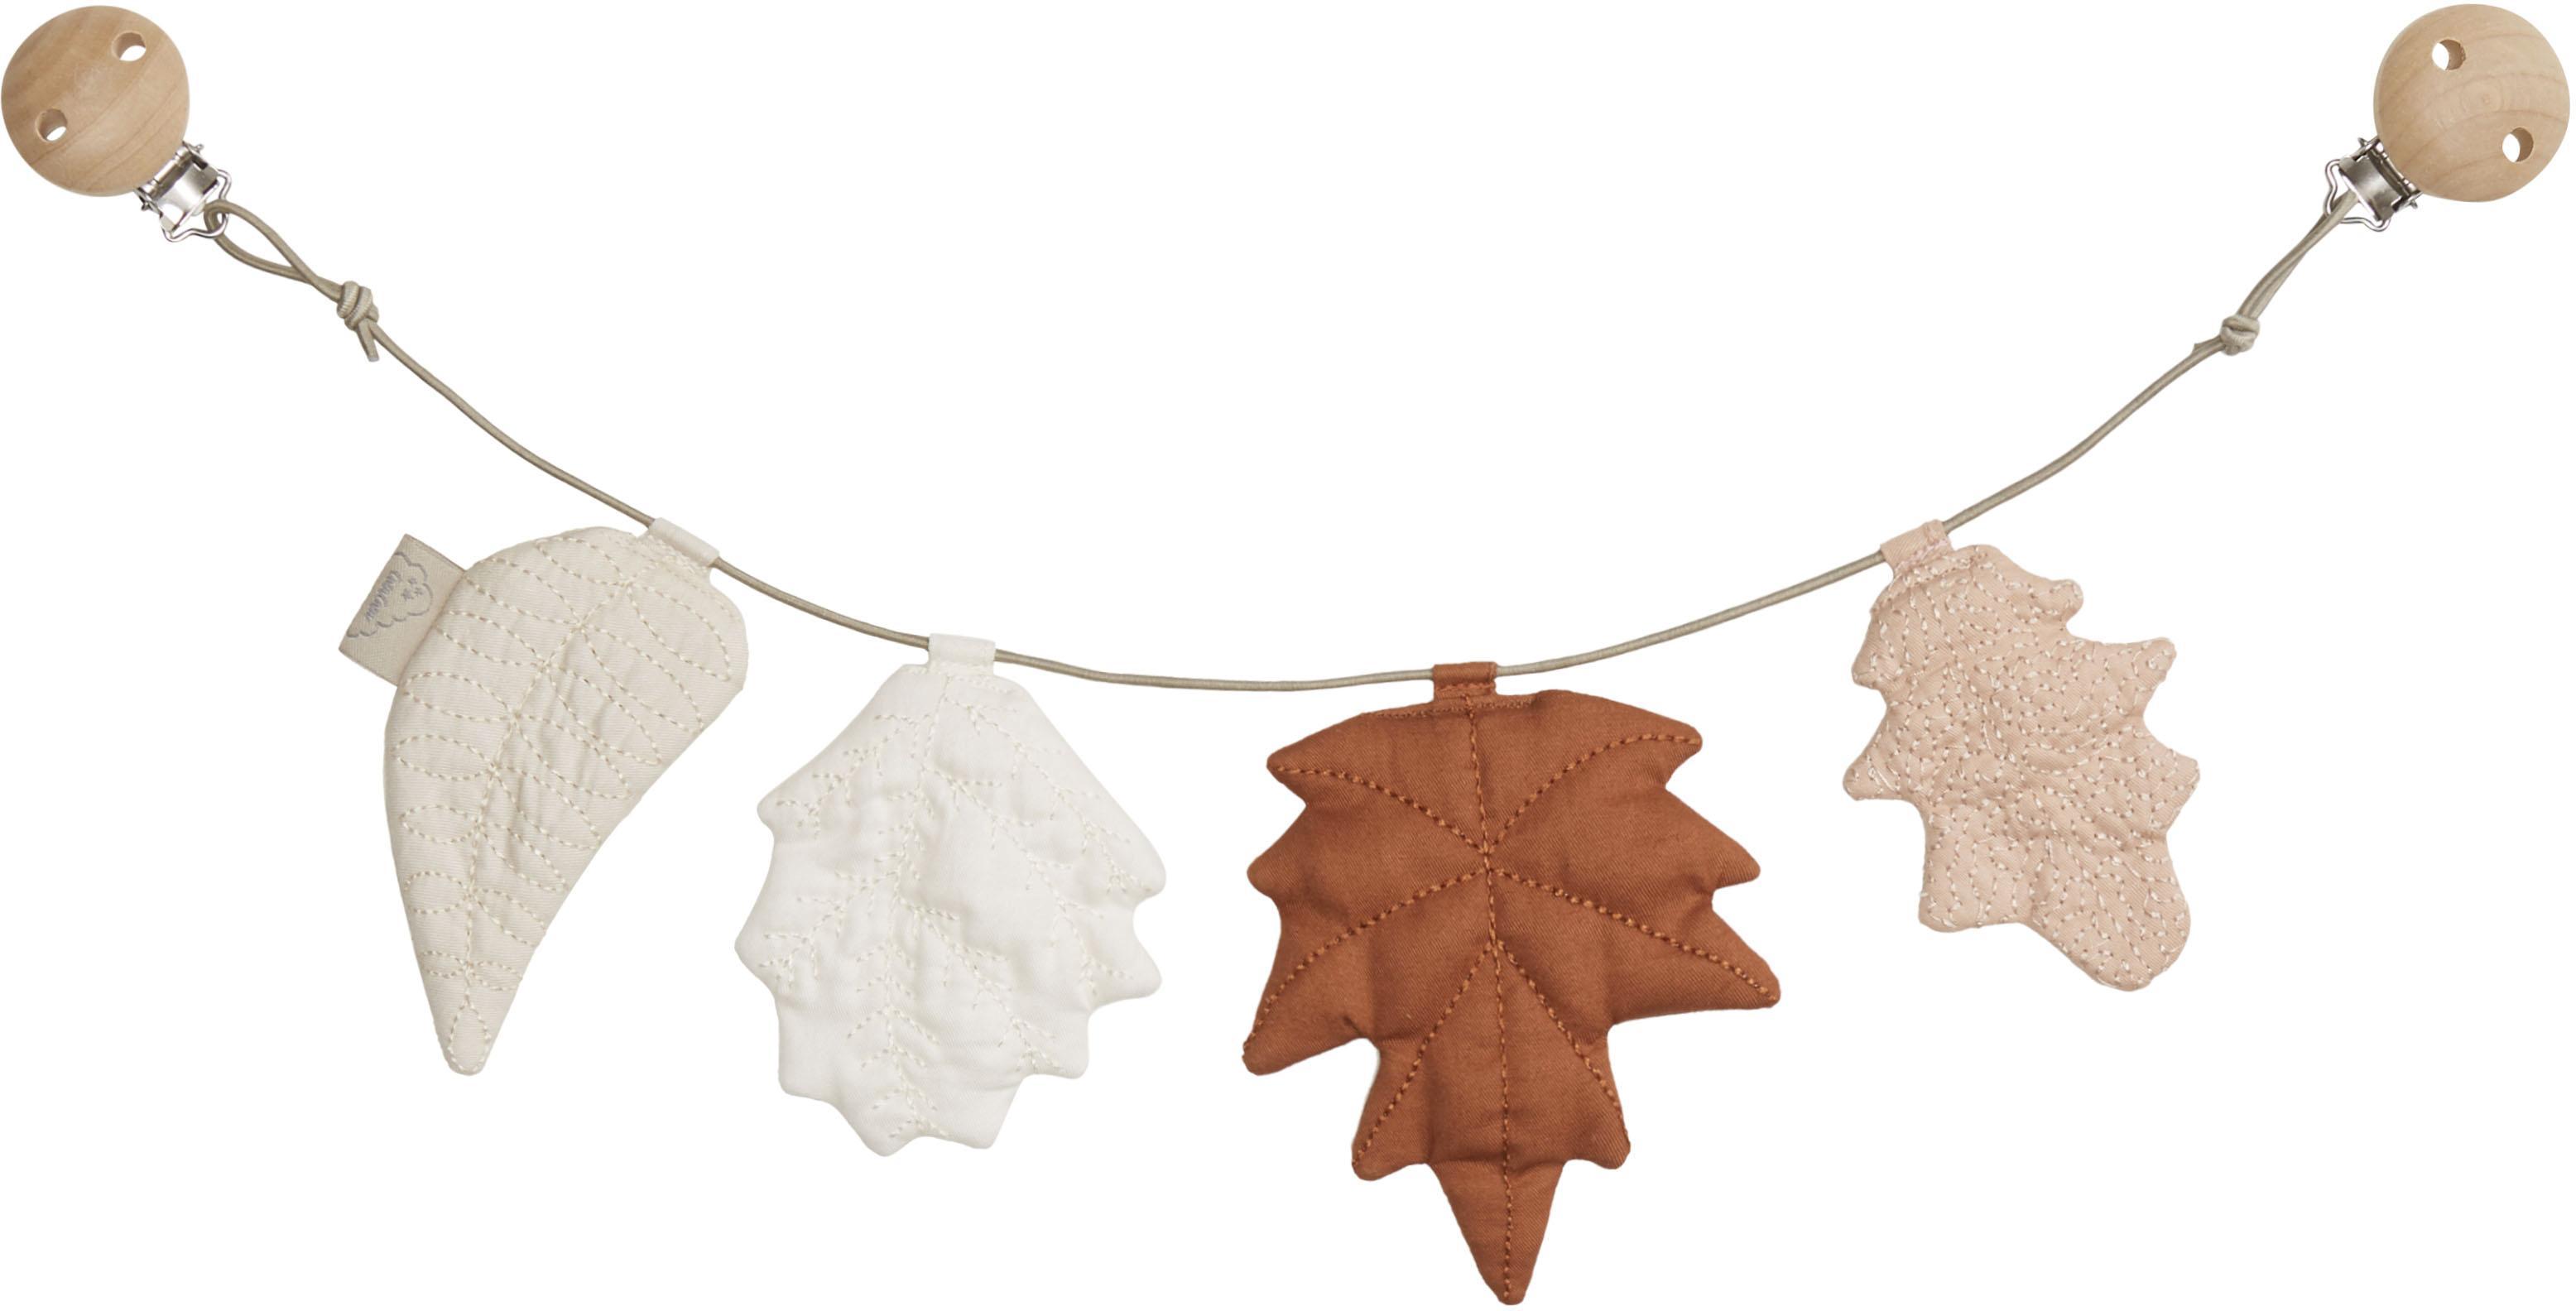 Kinderwagen ketting Leaves van biokatoen, 100% biokatoen, Bruin, beigetinten, L 50 x H 16 cm